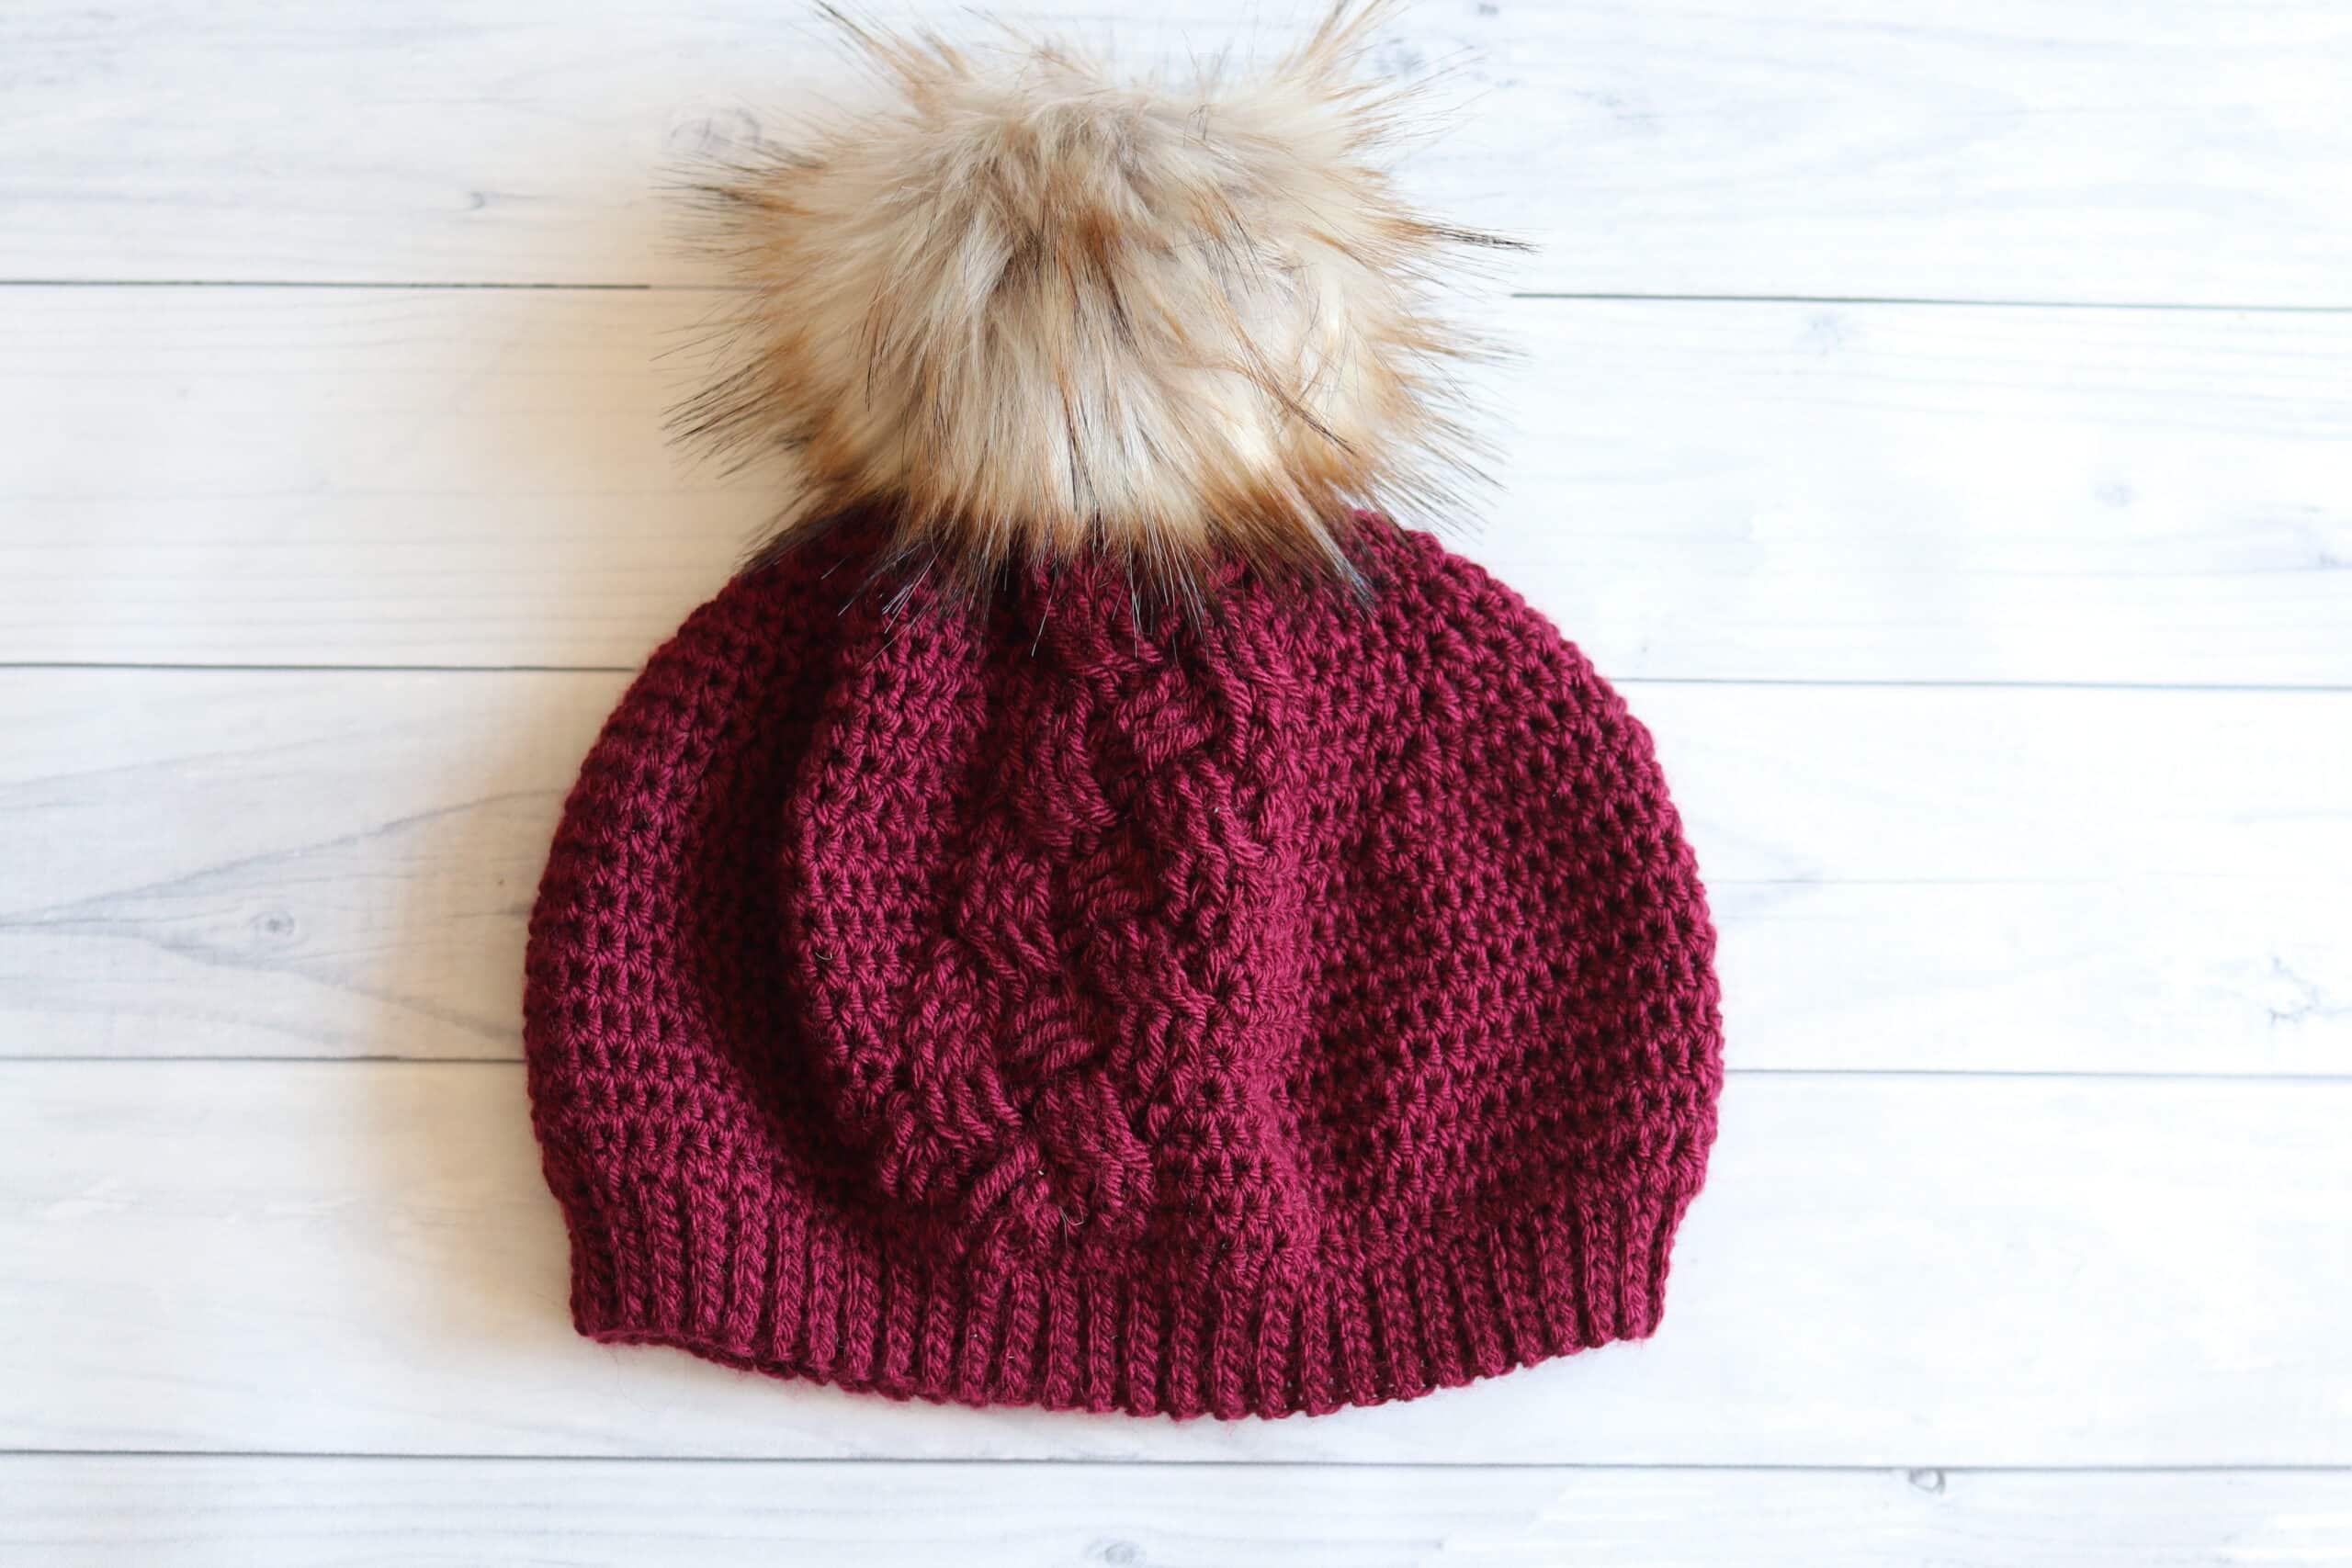 red crochet hat white pompom white background